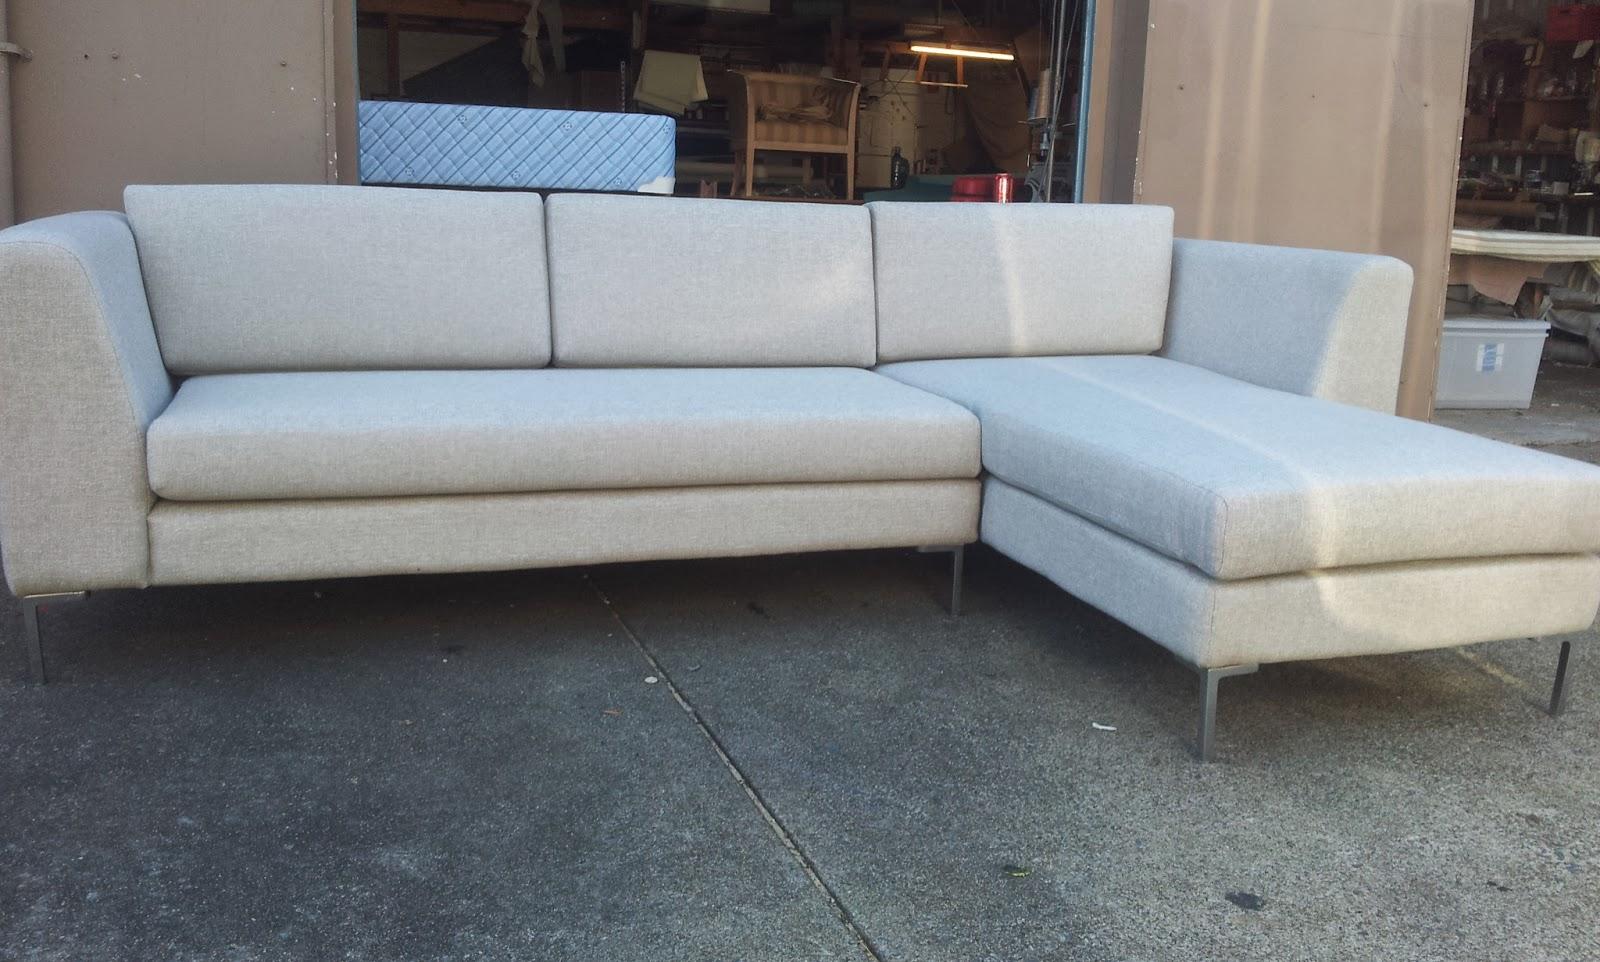 sofa maker house of sofas ann arbor made to order ashton fabric 2